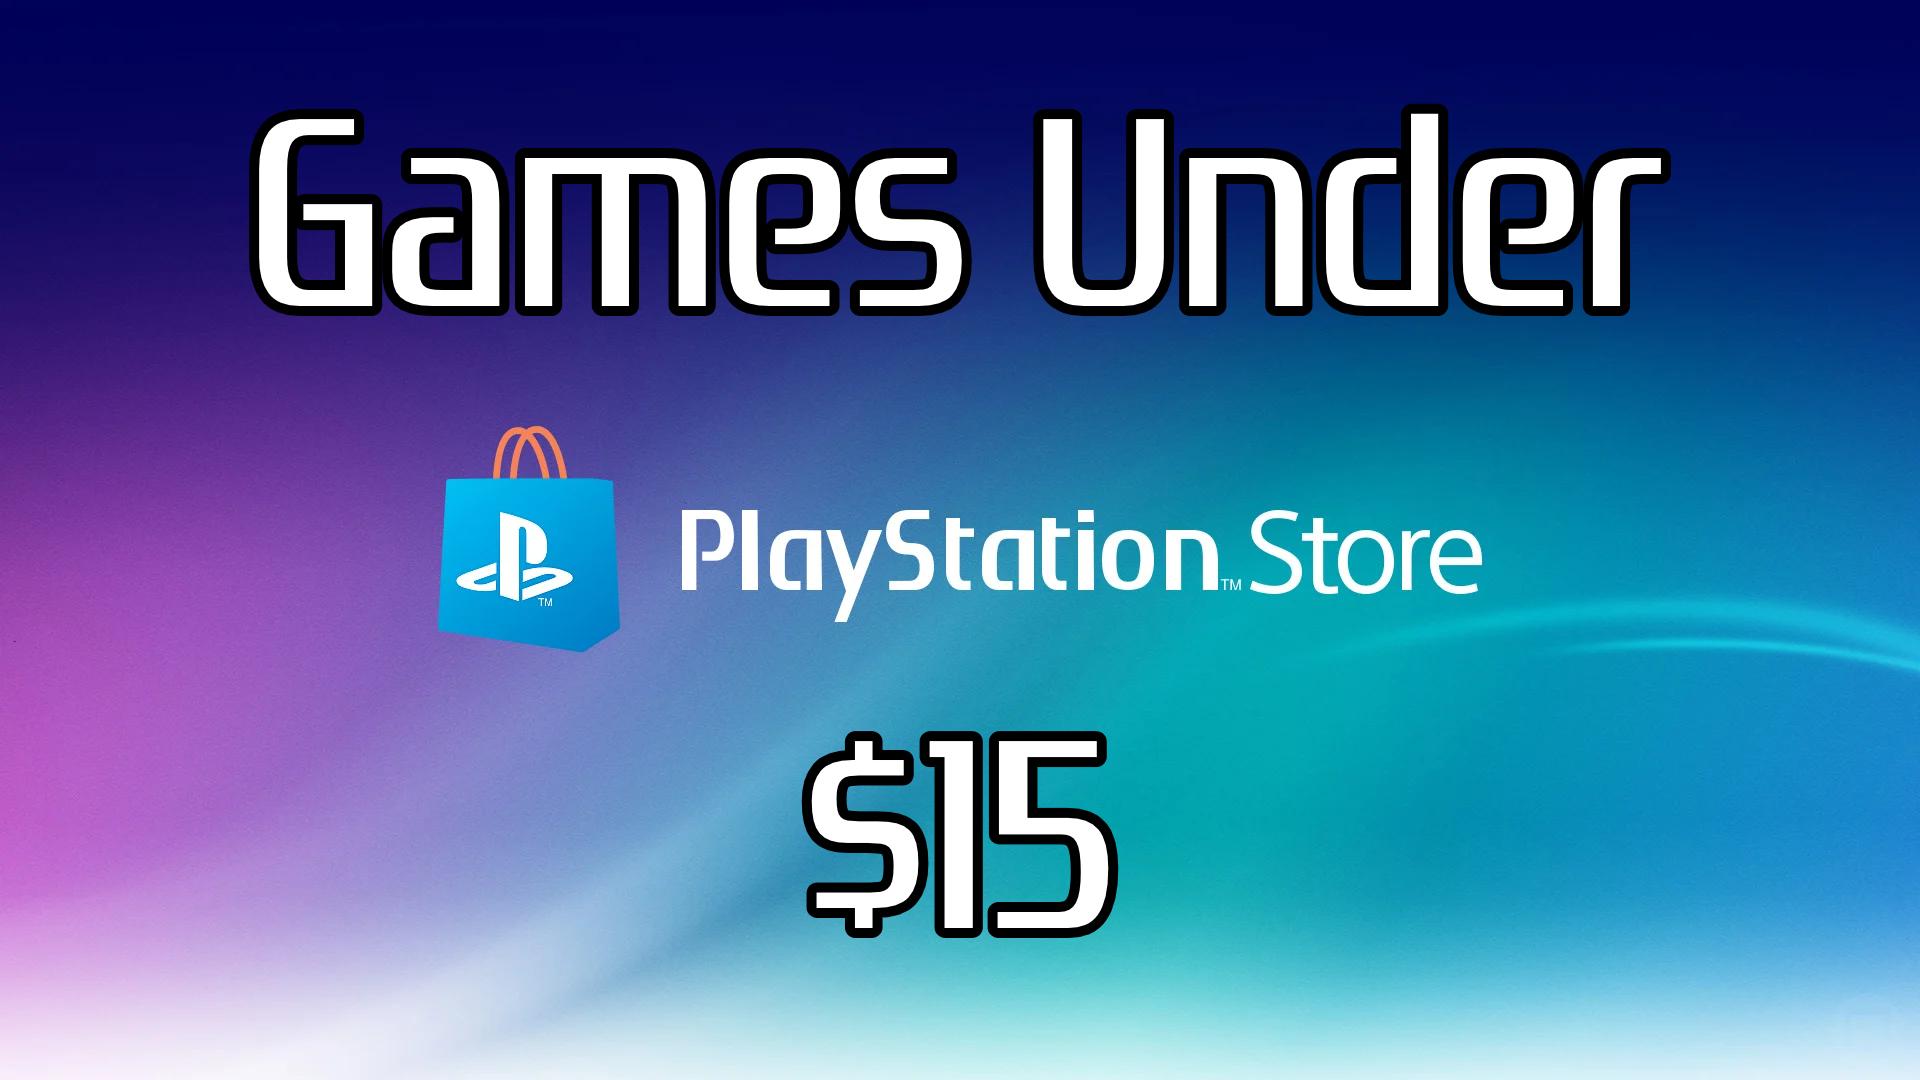 Playstation Games under $15 – 10/30/2020